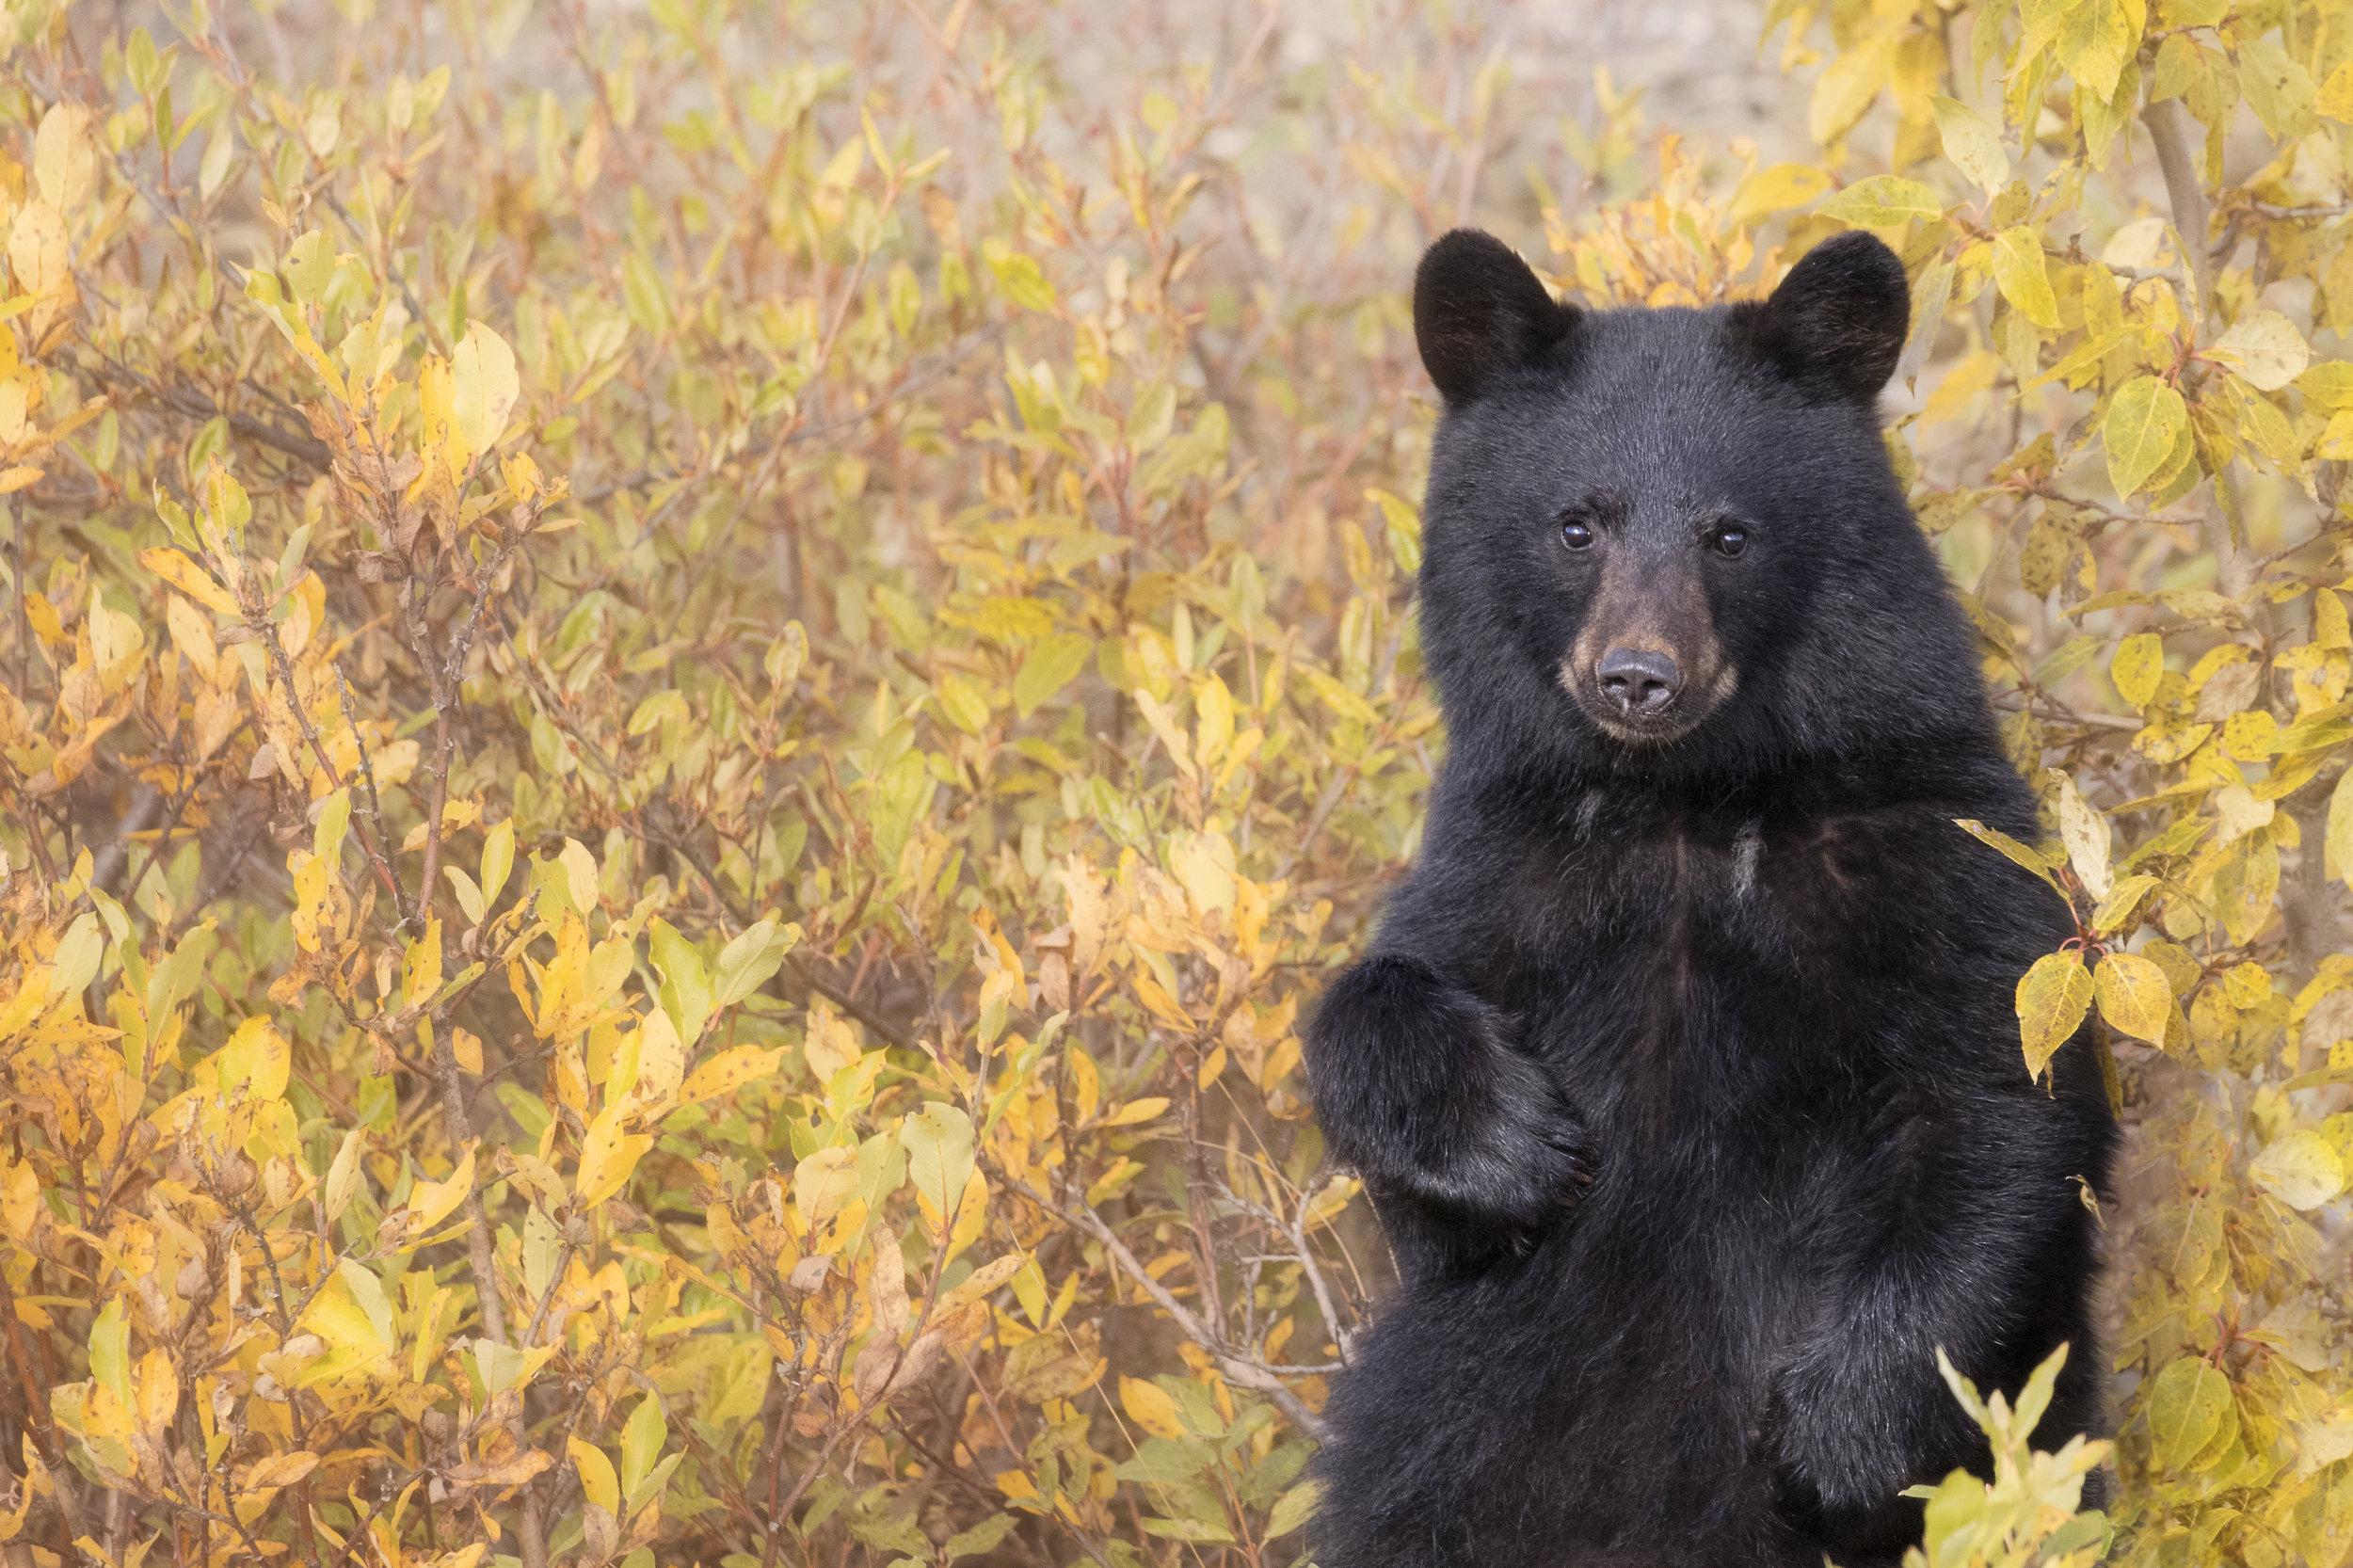 Black Bear Cub - Across the Blue Planet